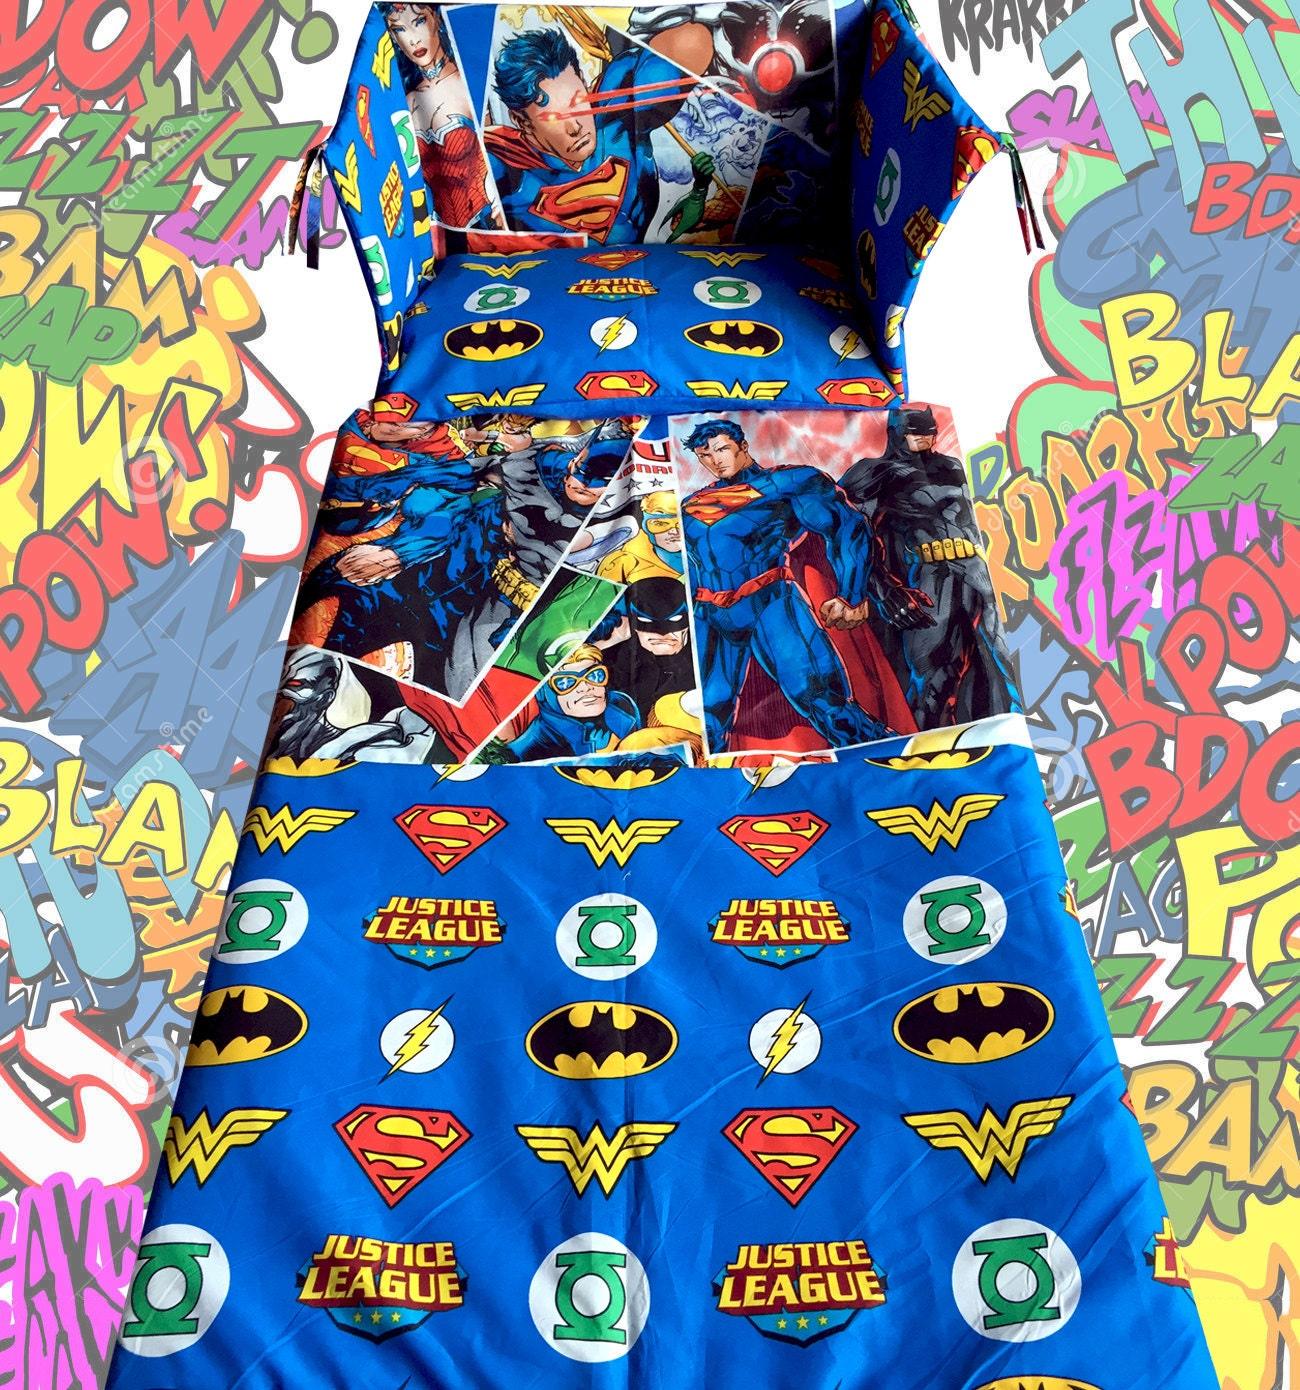 Vintage superhero bedding - New Justice League Cot Bedding Set Batman Superman Super Heroes Exclusive